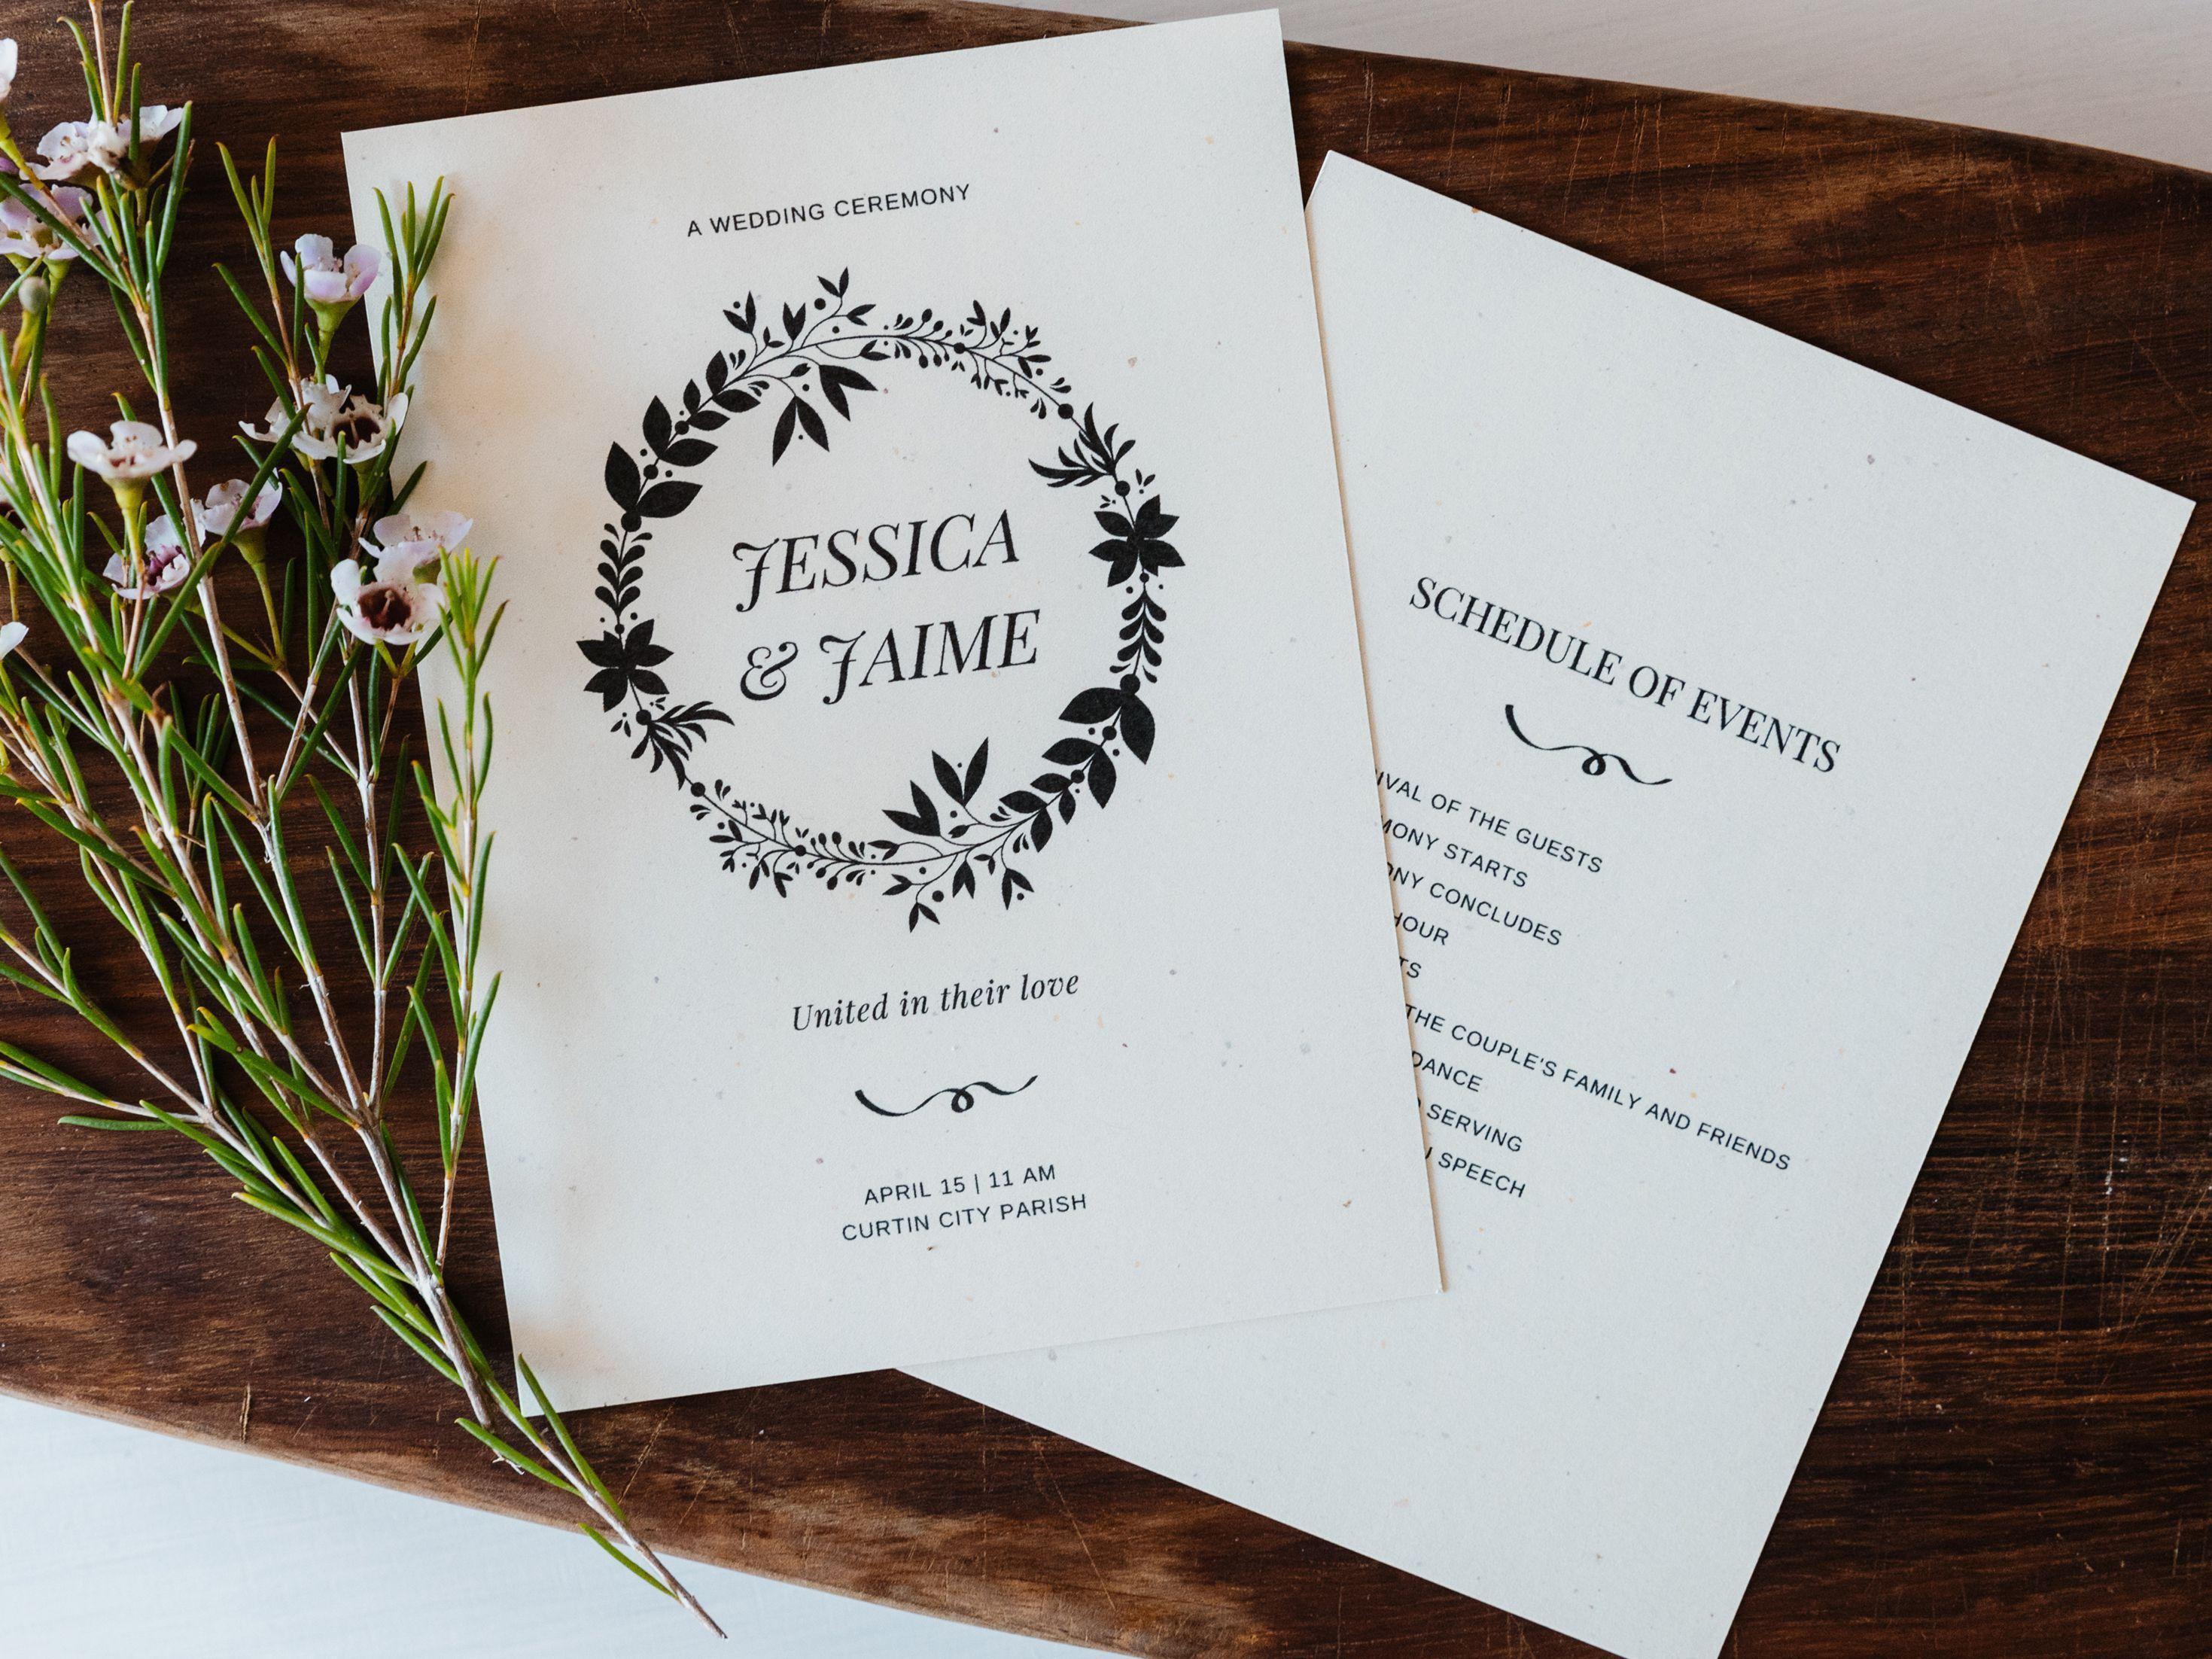 006 Stunning Trifold Wedding Program Template High Resolution  Tri Fold Word Folded ExampleFull